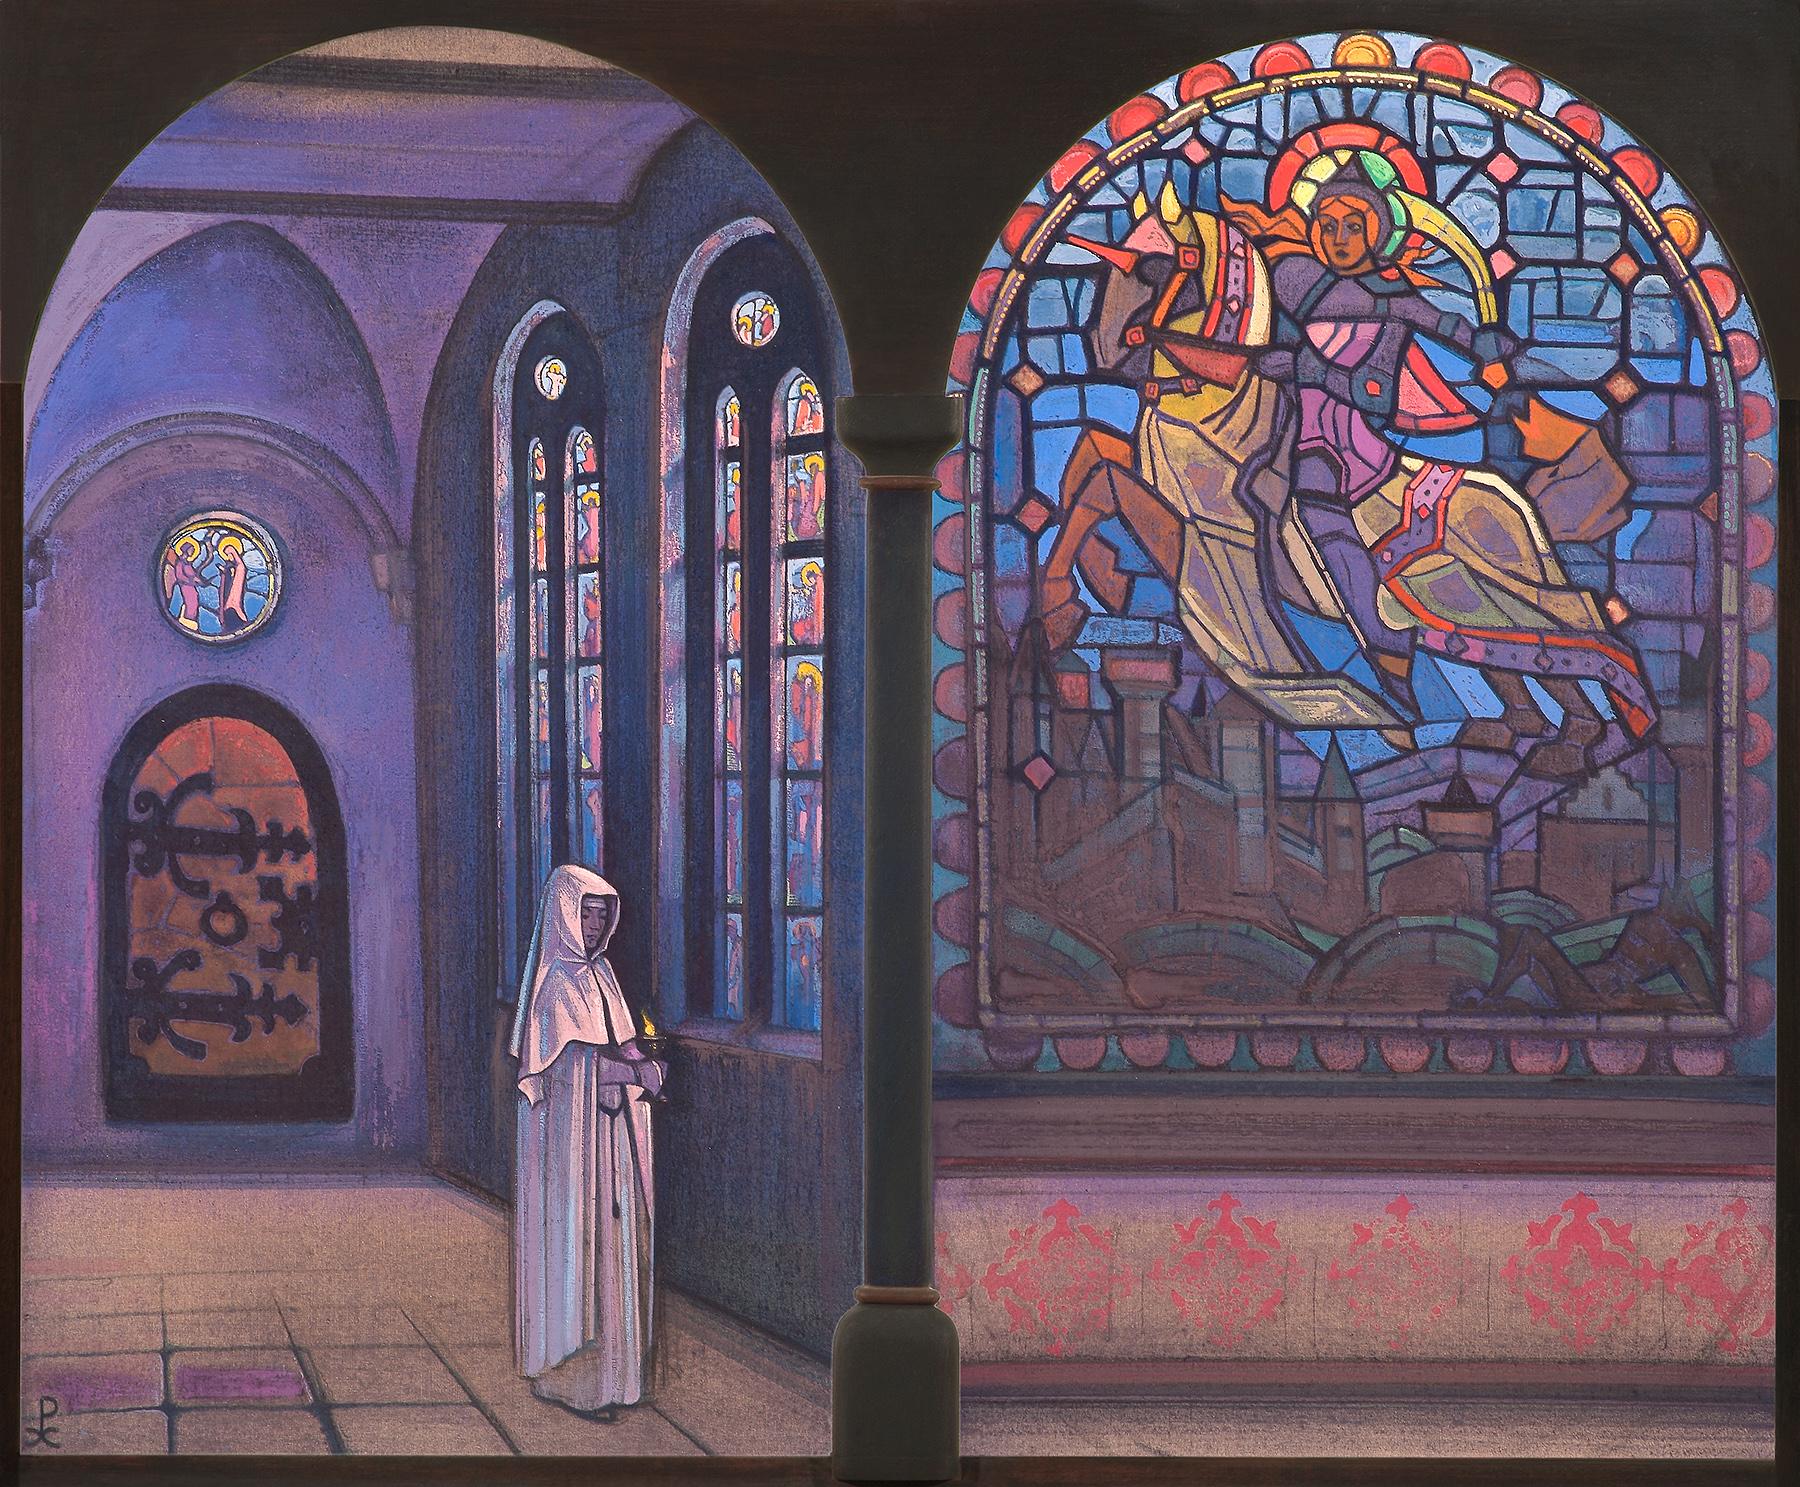 Glory to the hero, Nicholas Roerich